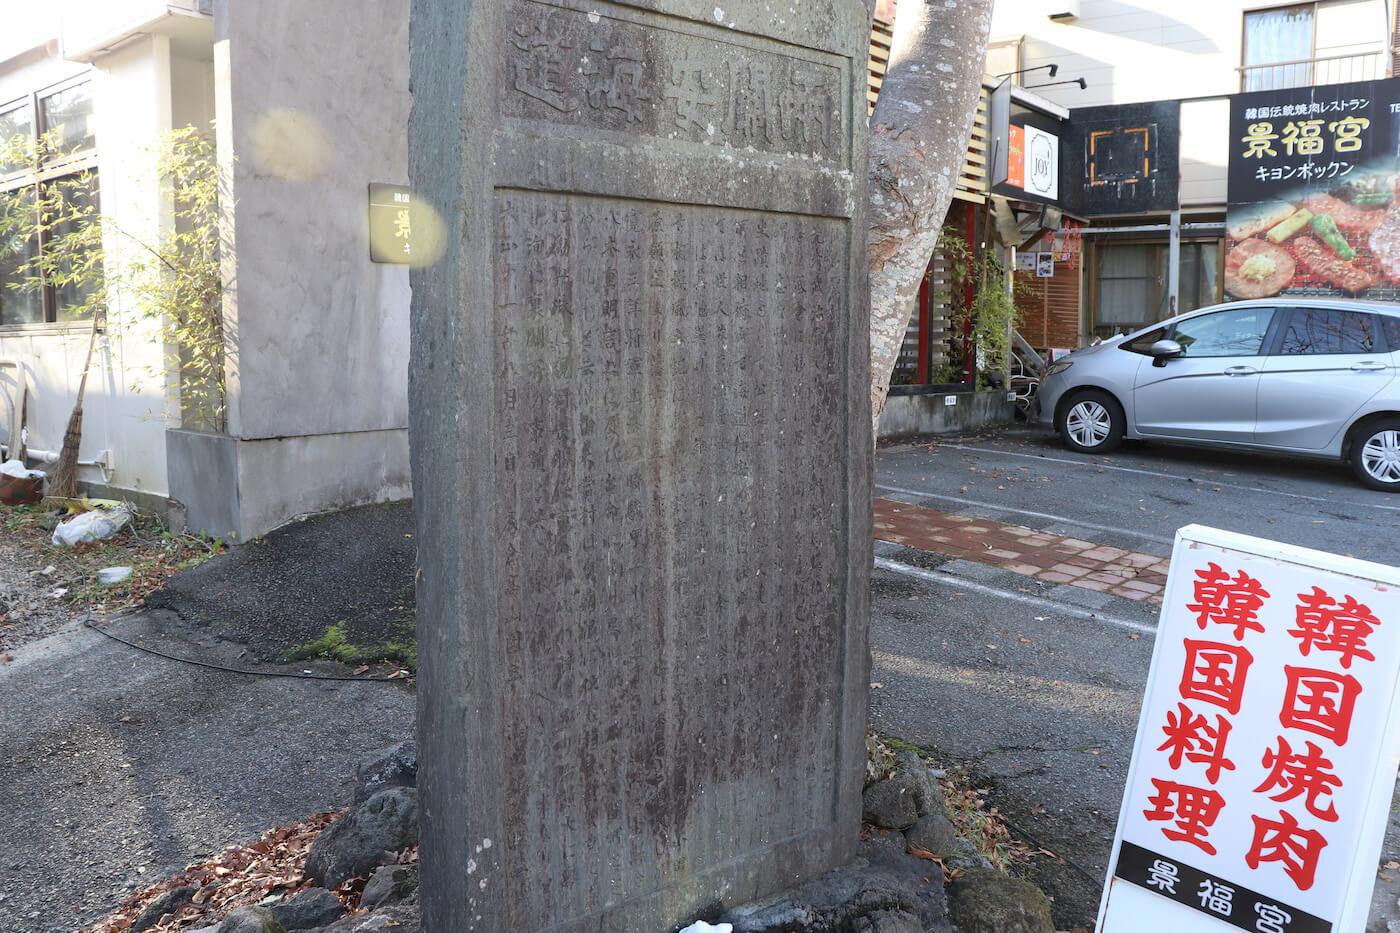 仙石原関所跡の石碑